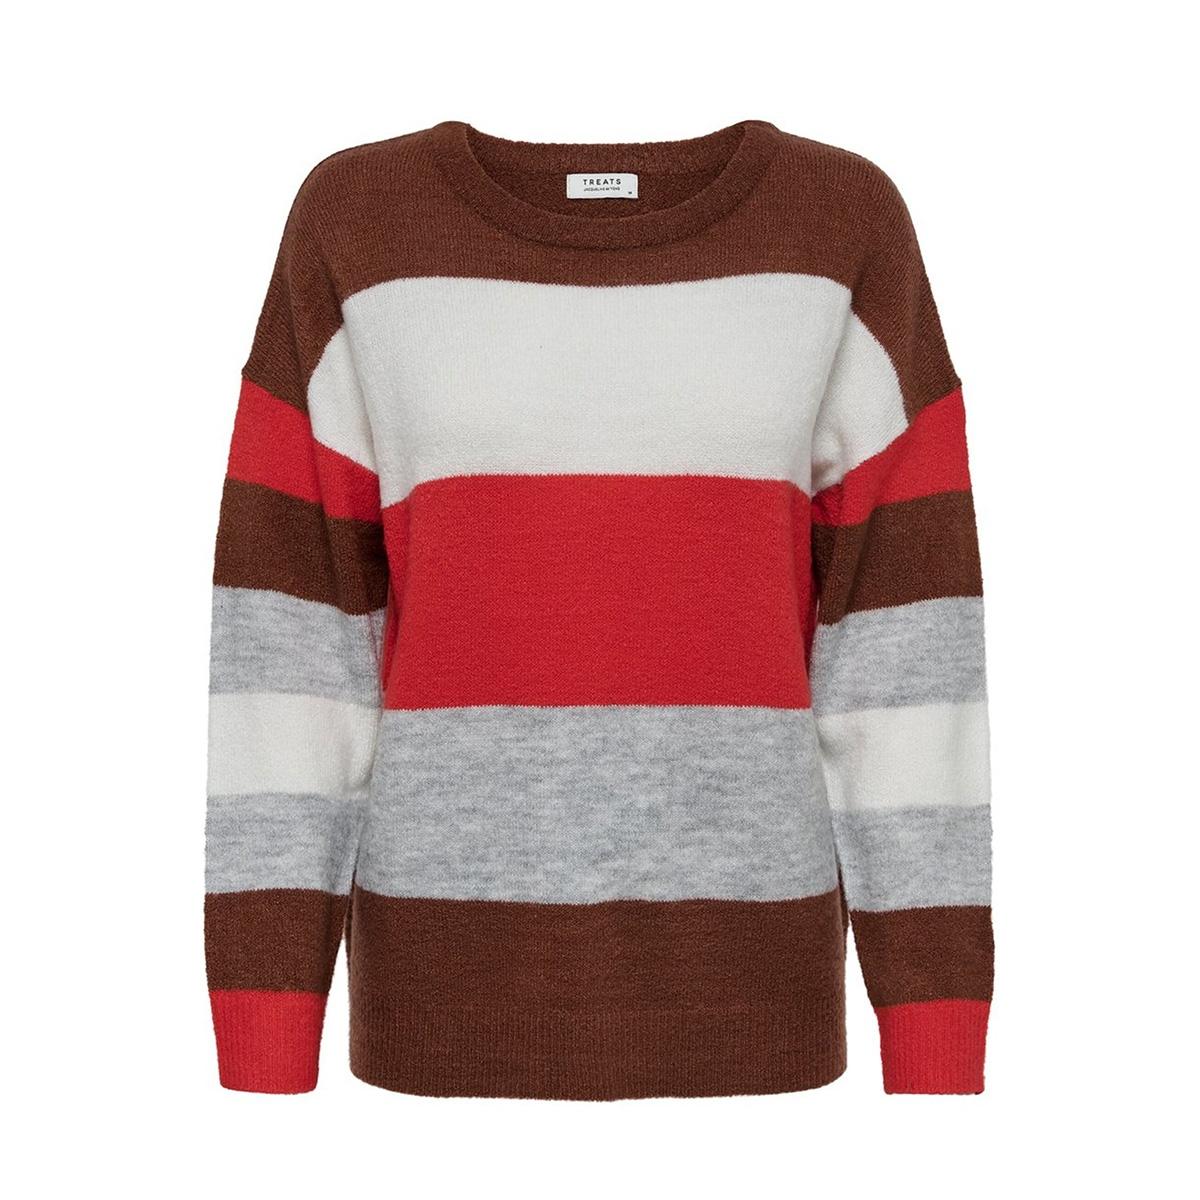 jdynora treats l/s noos pullover kn 15176704 jacqueline de yong trui smoked paprika/stripe